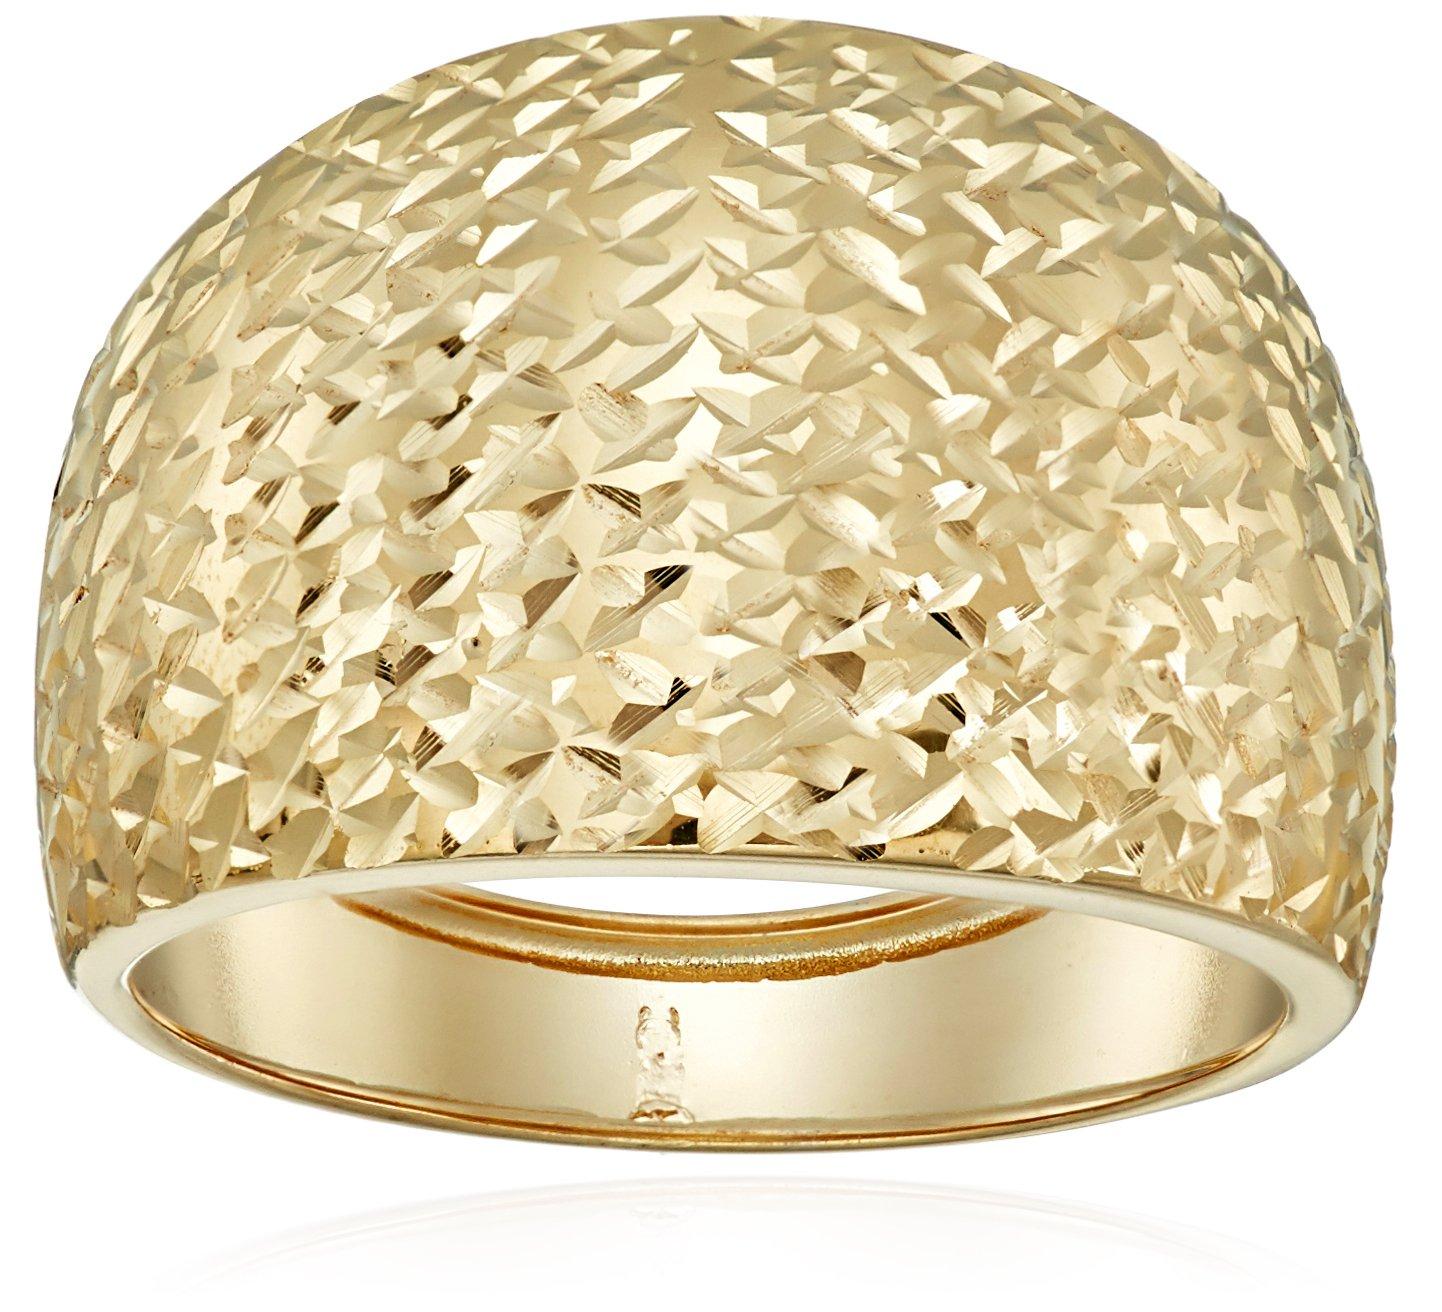 14k Yellow Gold Italian Bold Diamond-Cut Dome Band Ring, Size 8